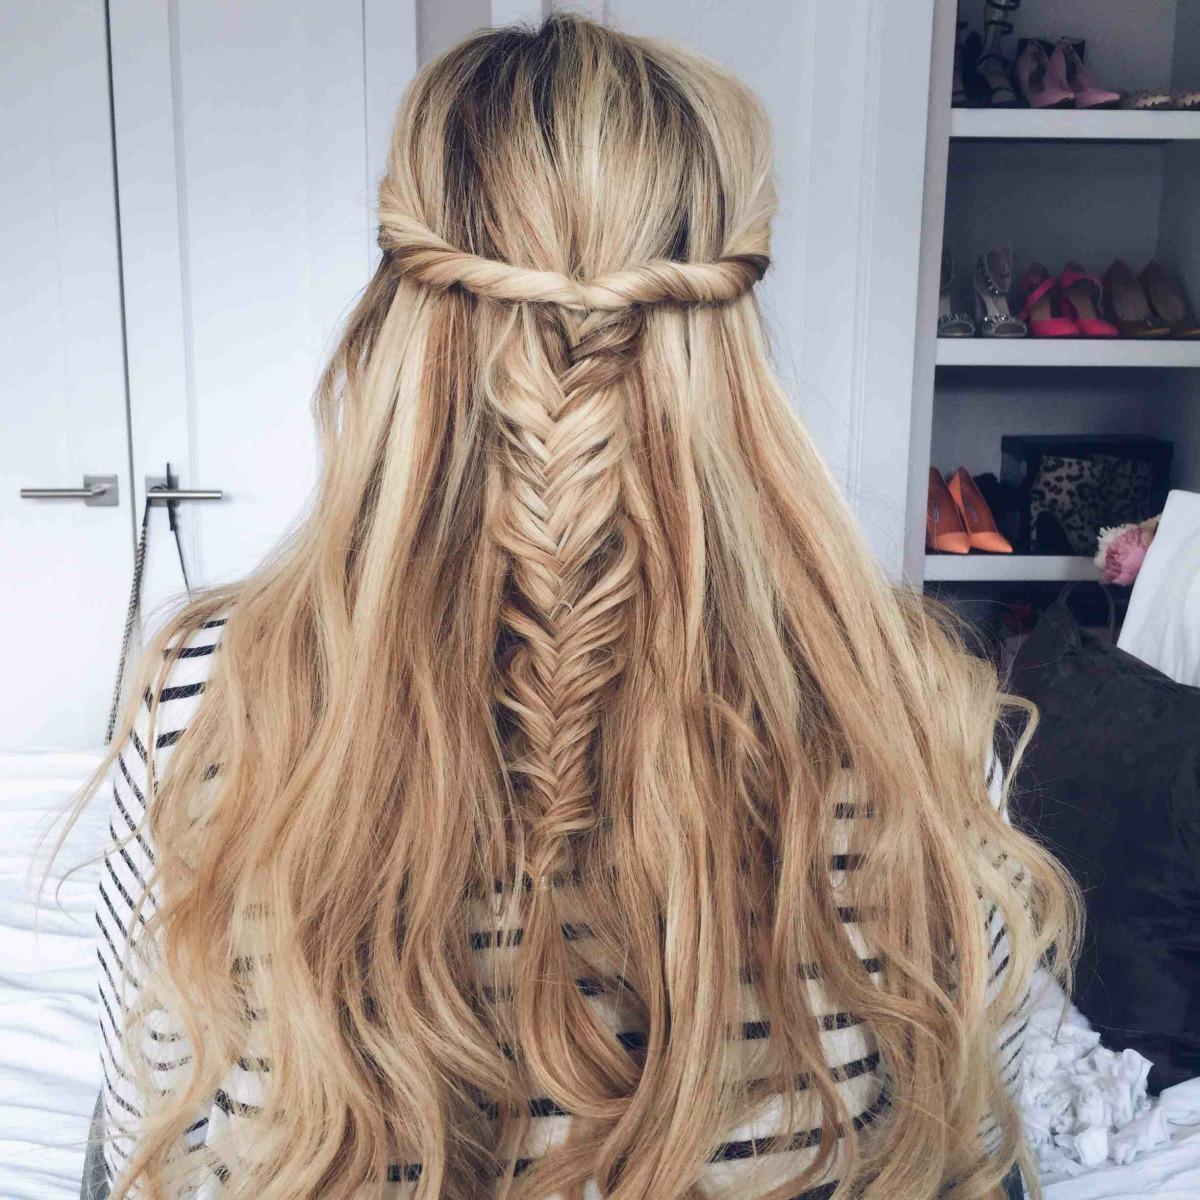 Amber Fillerup's Blog: The Barefoot Blonde, fishtail braid